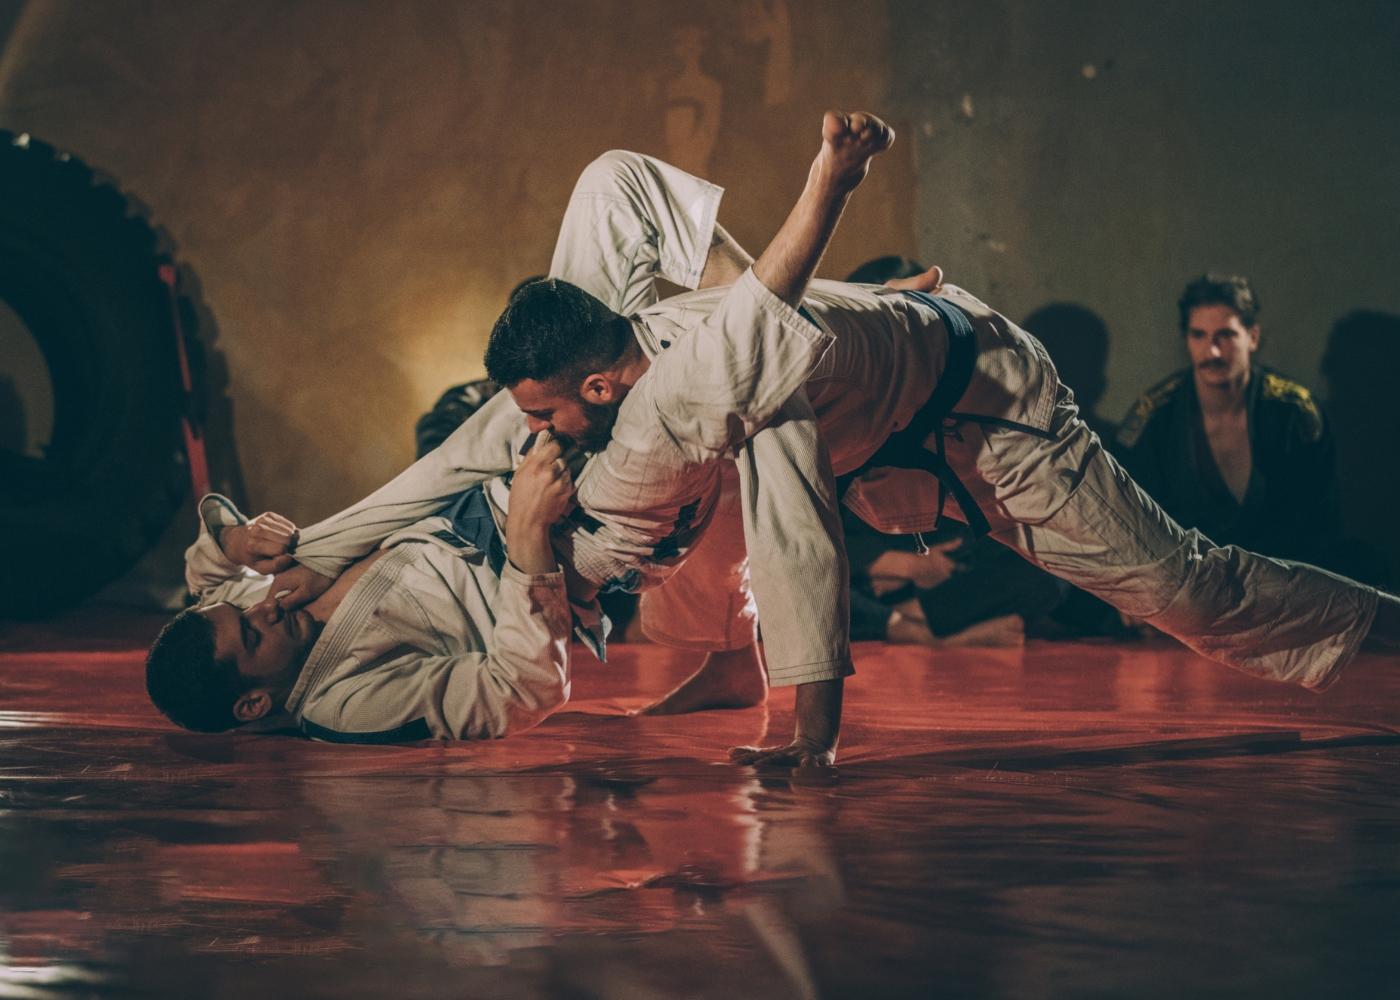 Homens a praticar Ju-jitsu